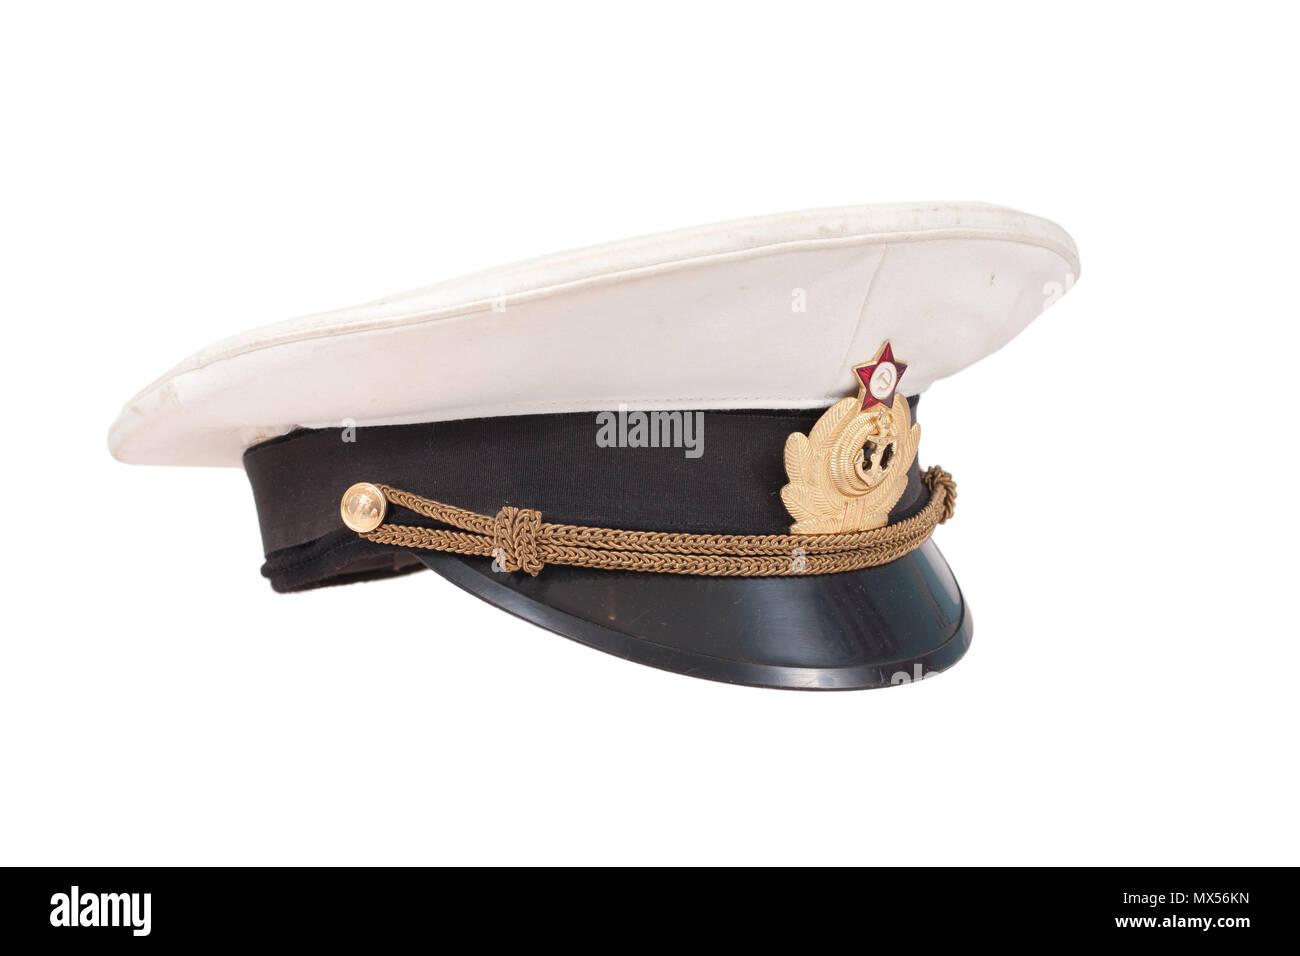 7003c4abe Soviet Navy Uniform Stock Photos & Soviet Navy Uniform Stock Images ...